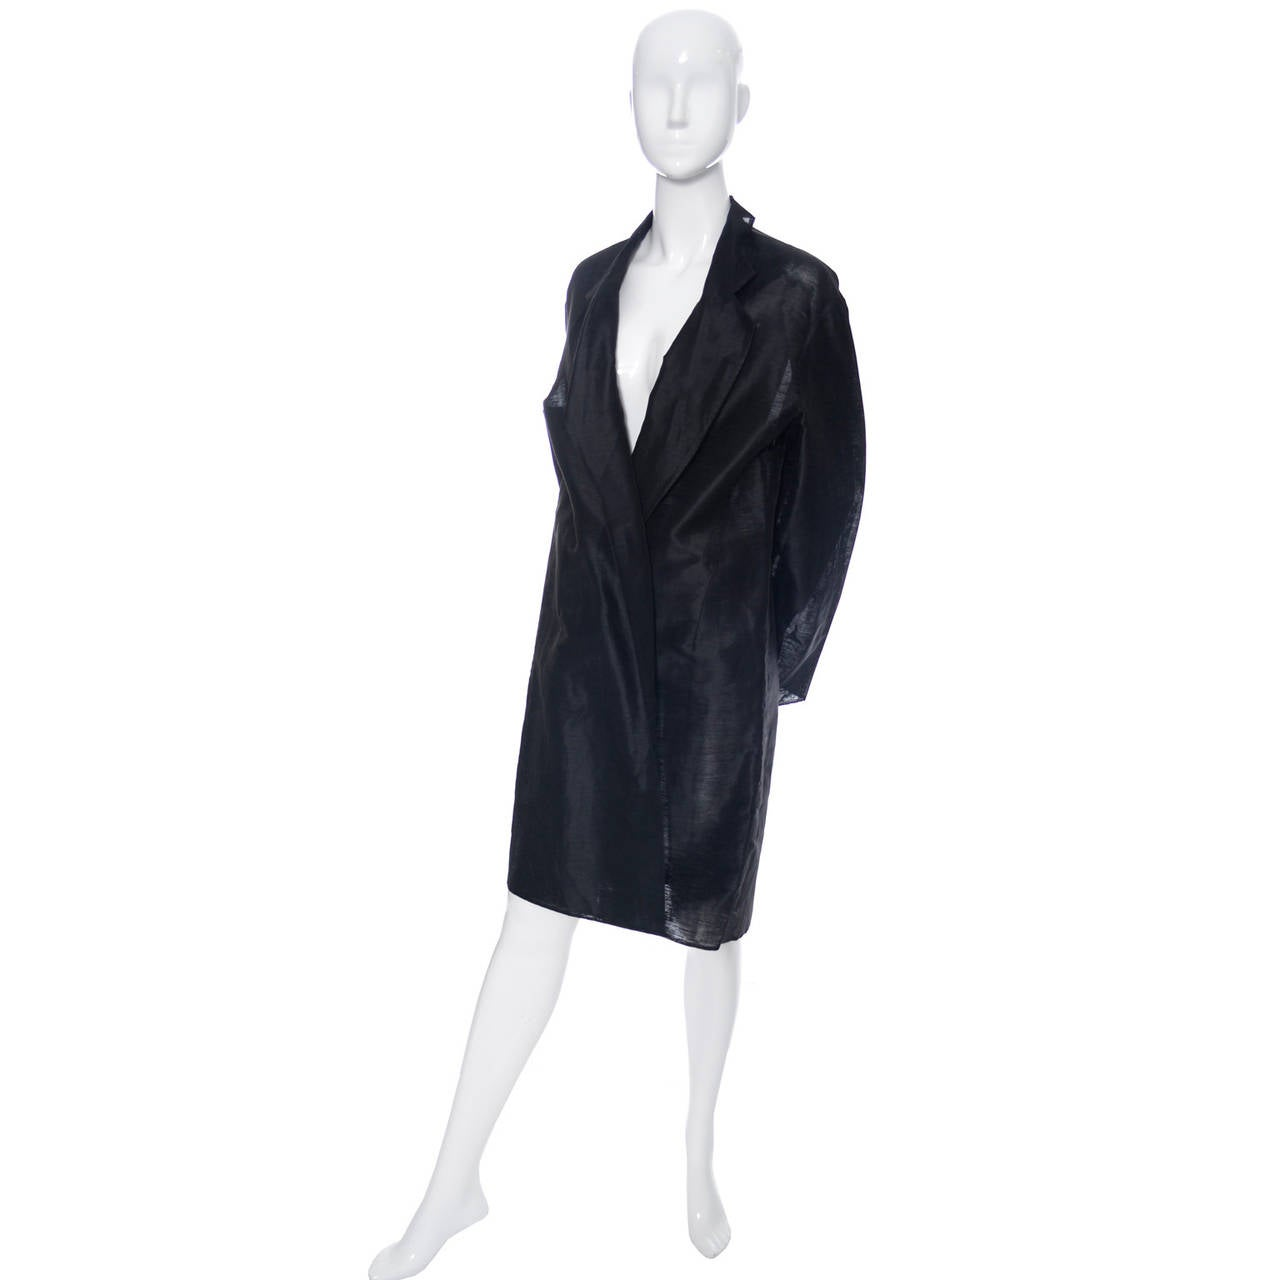 Women's Donna Karan New York Black Label Linen Organza Evening Coat Semi Sheer